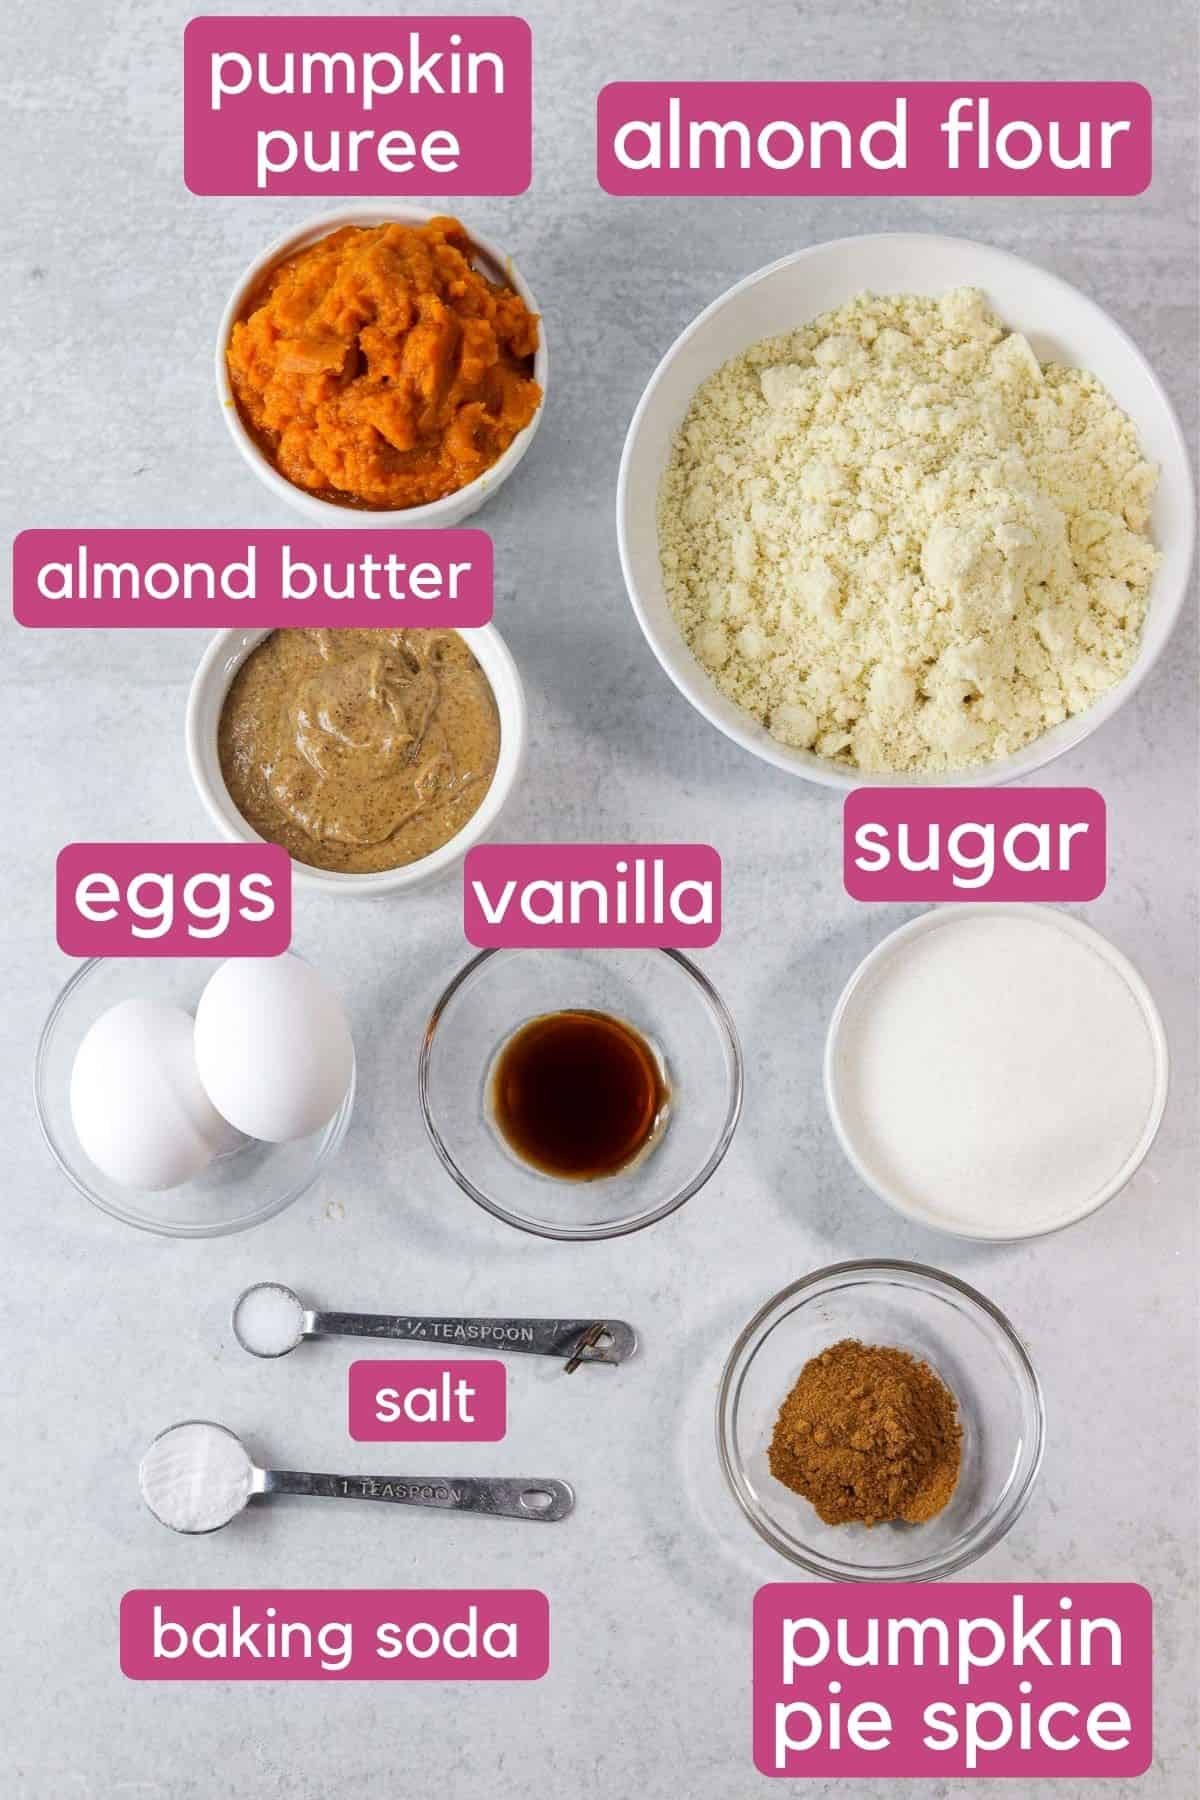 gluten free pumpkin muffin ingredients on the counter.